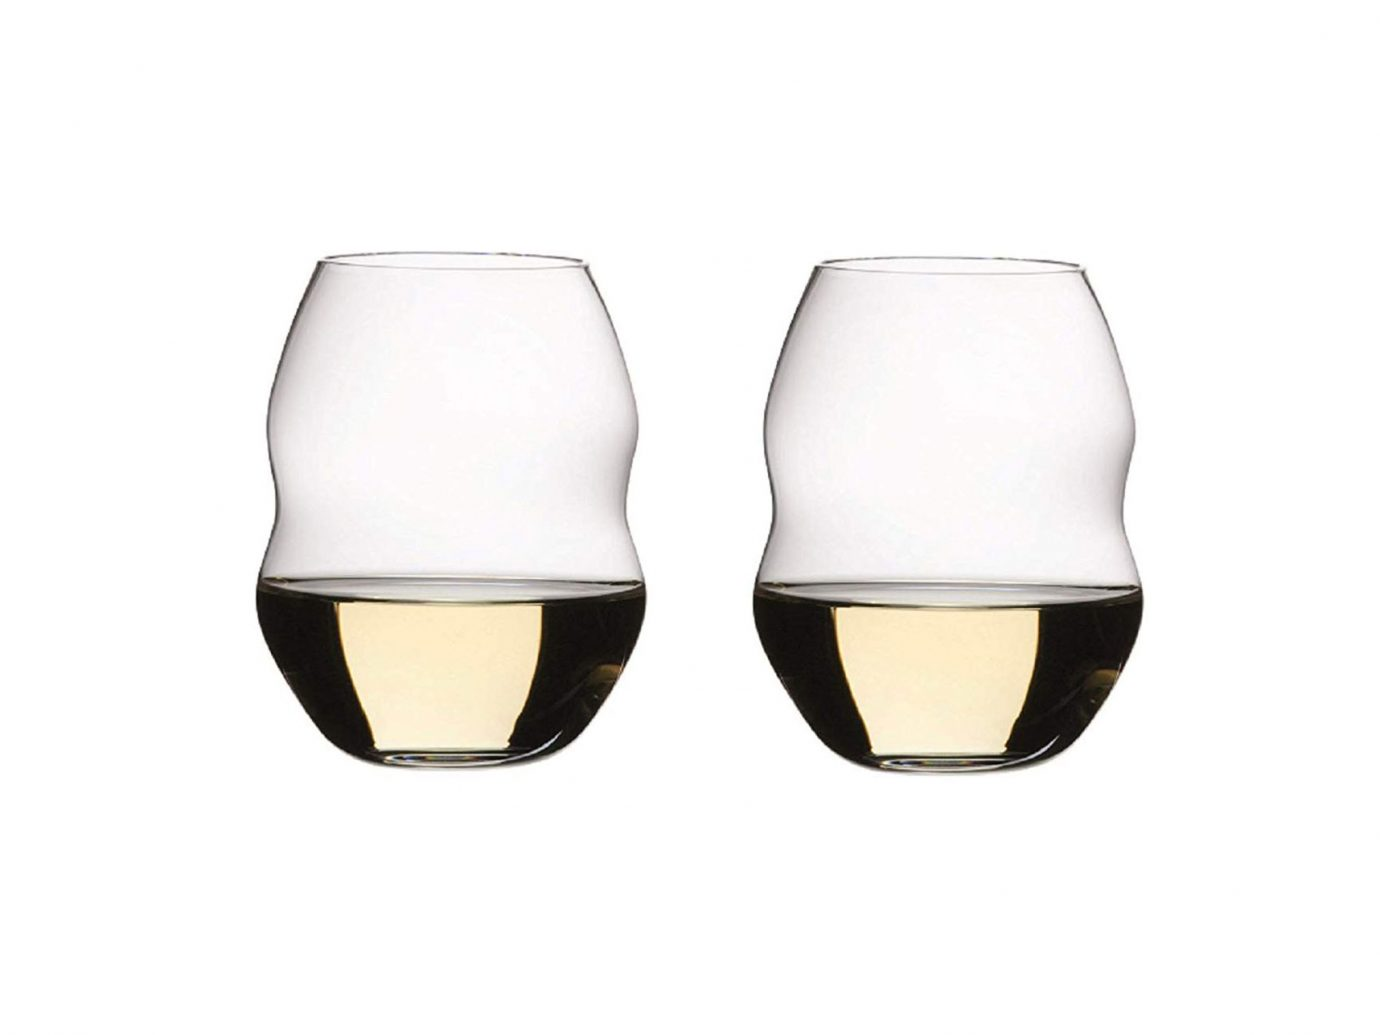 Buy Riedel Swirl White Wine Glasses on Amazon